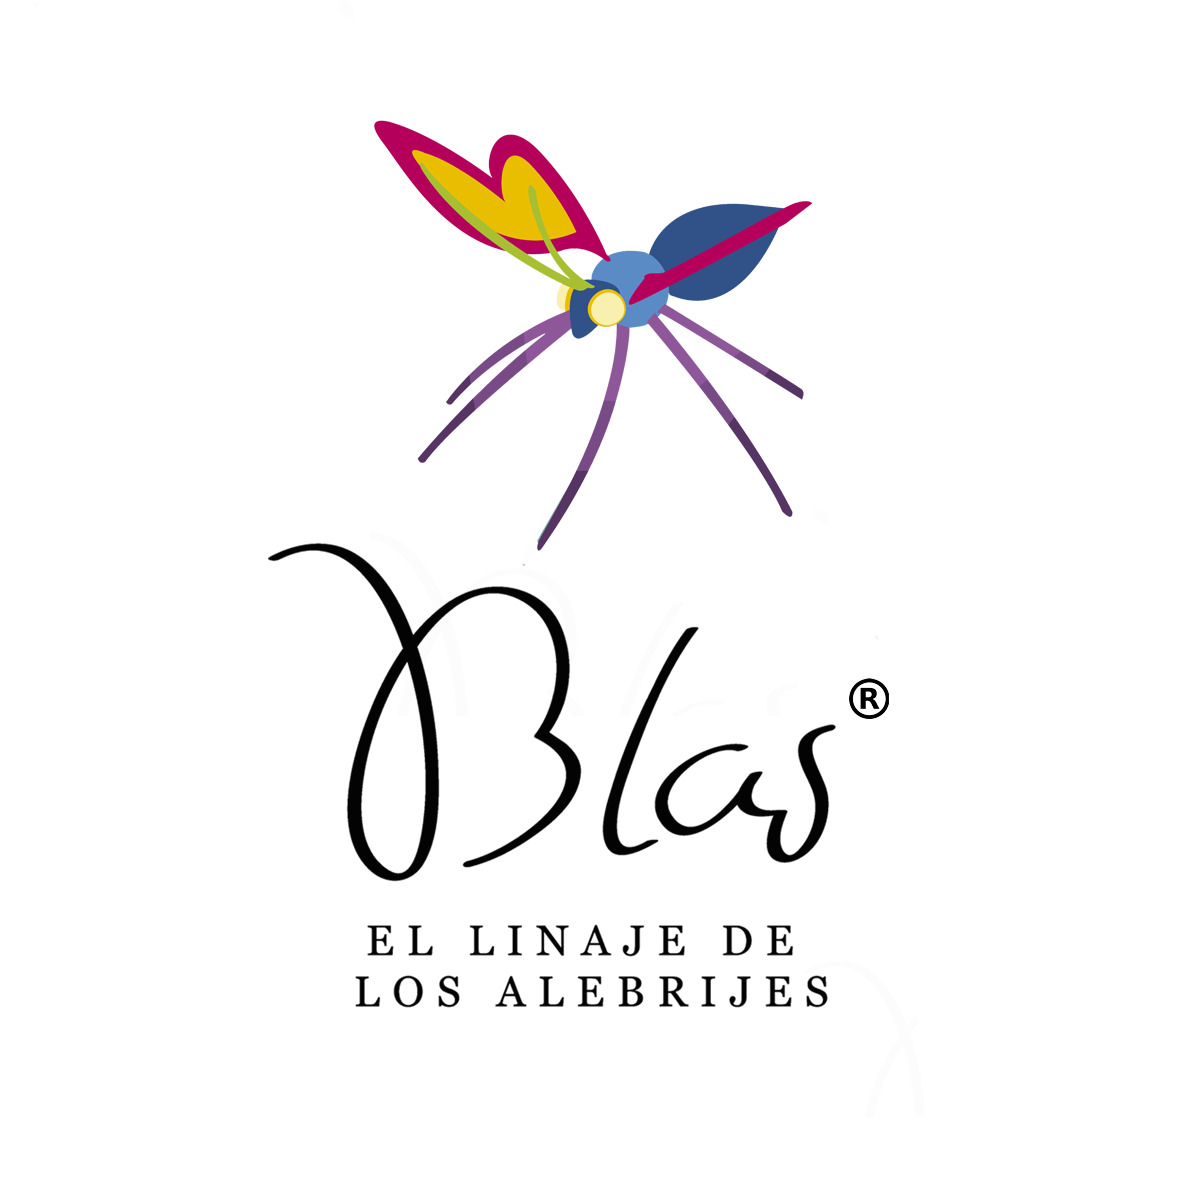 Alebrijes Blas